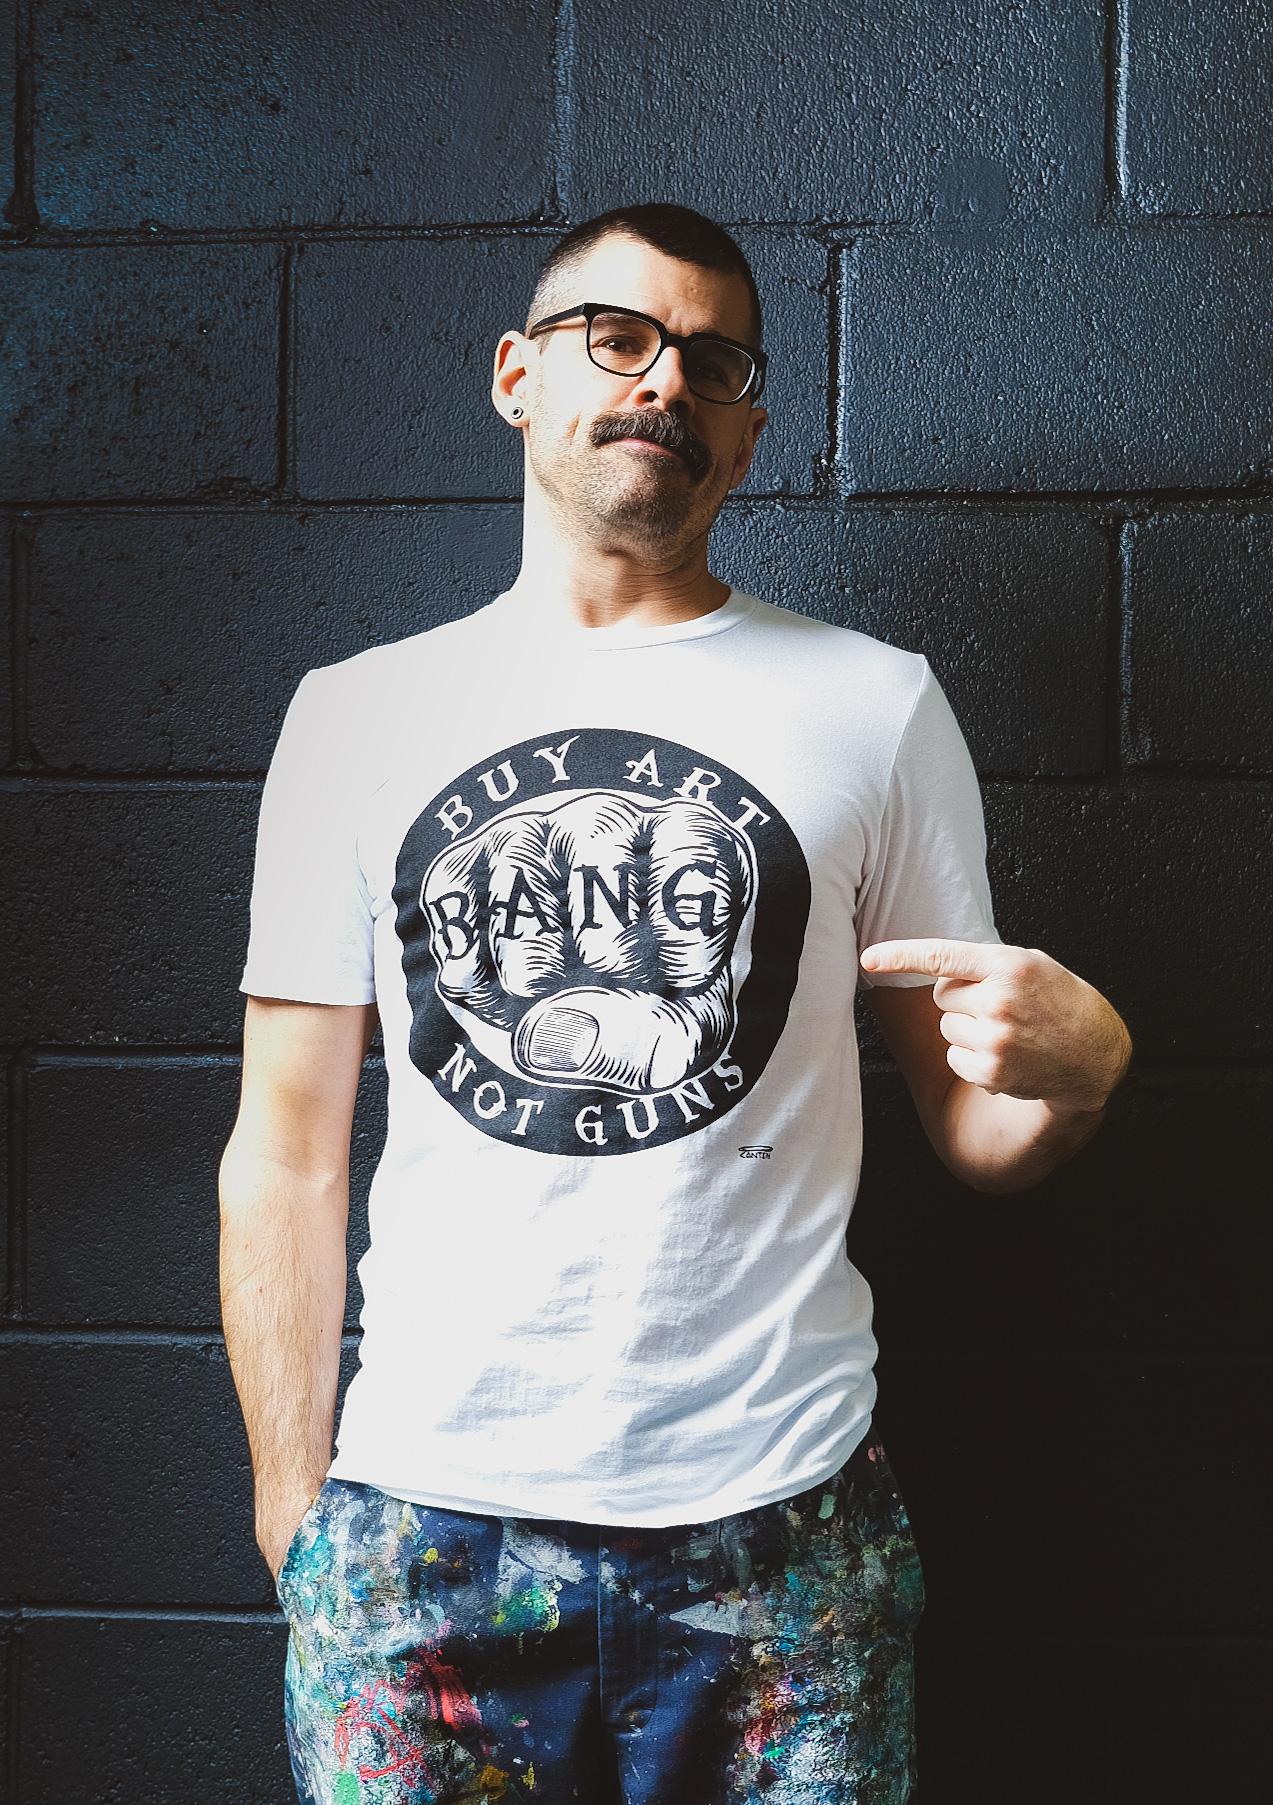 BANG Buy Art Not Guns tshirt